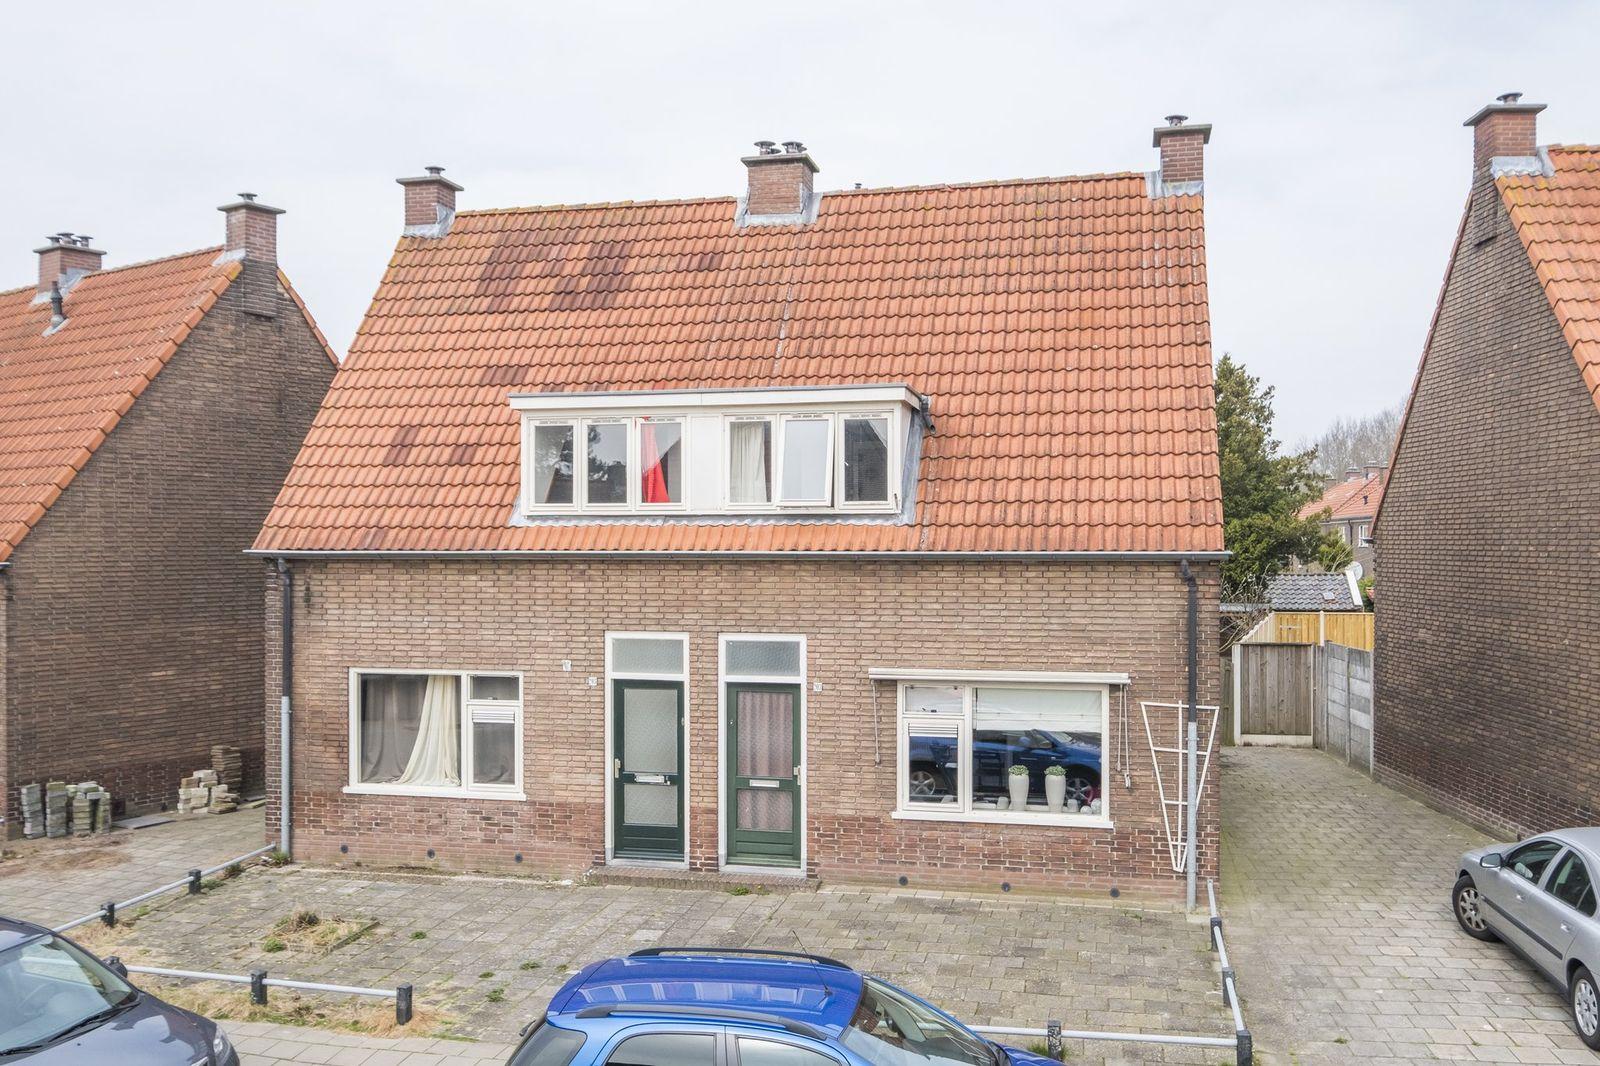 Rietstraat 203, Almelo